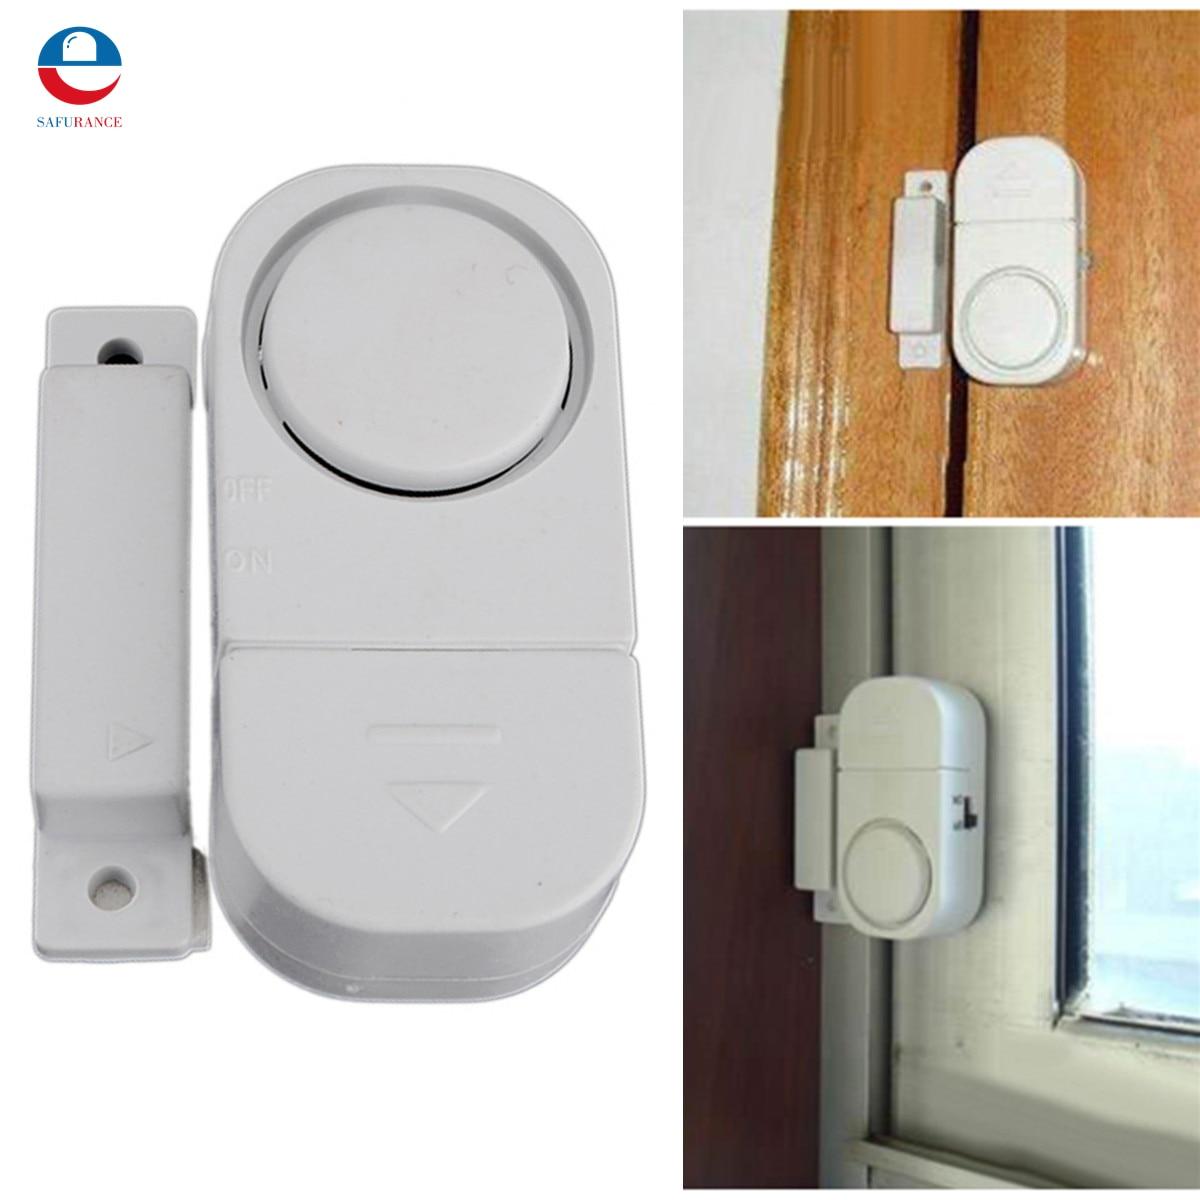 Wireless Security Door Entry System